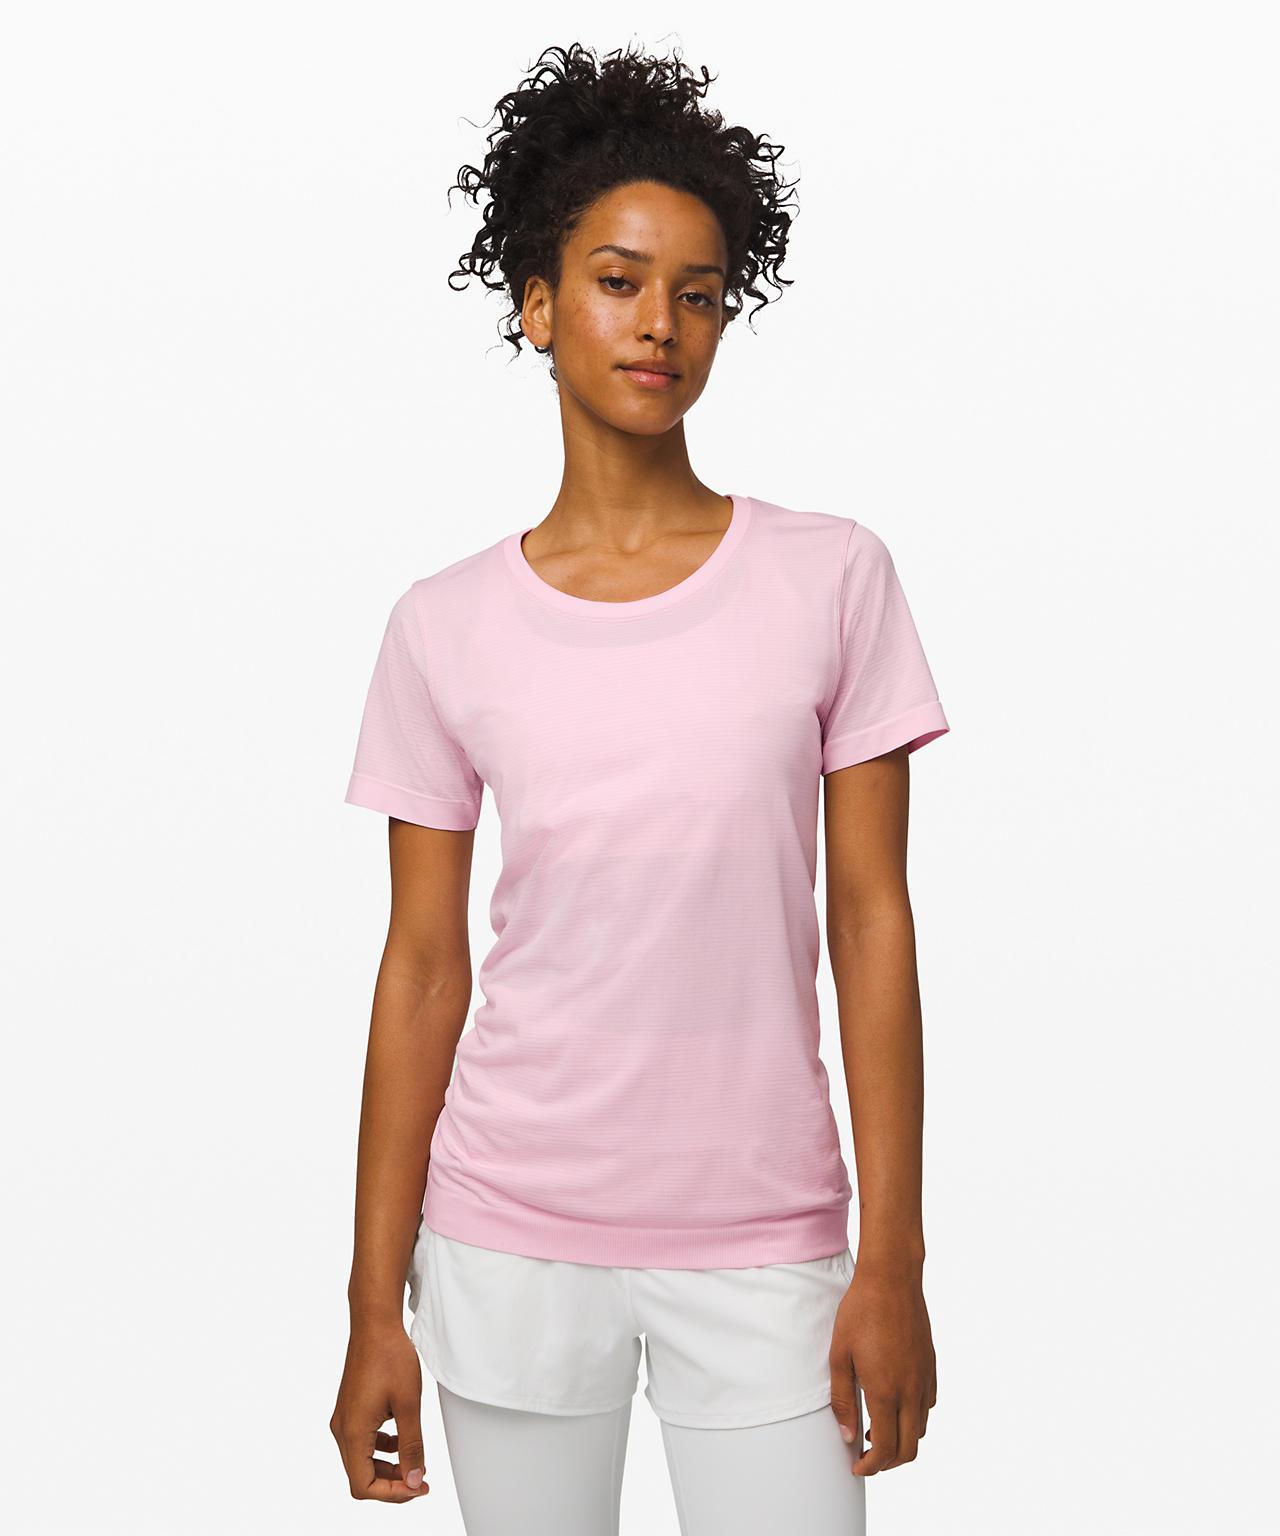 8c00d90e Swiftly Relaxed Short Sleeve   Women's Short Sleeve Shirts ...